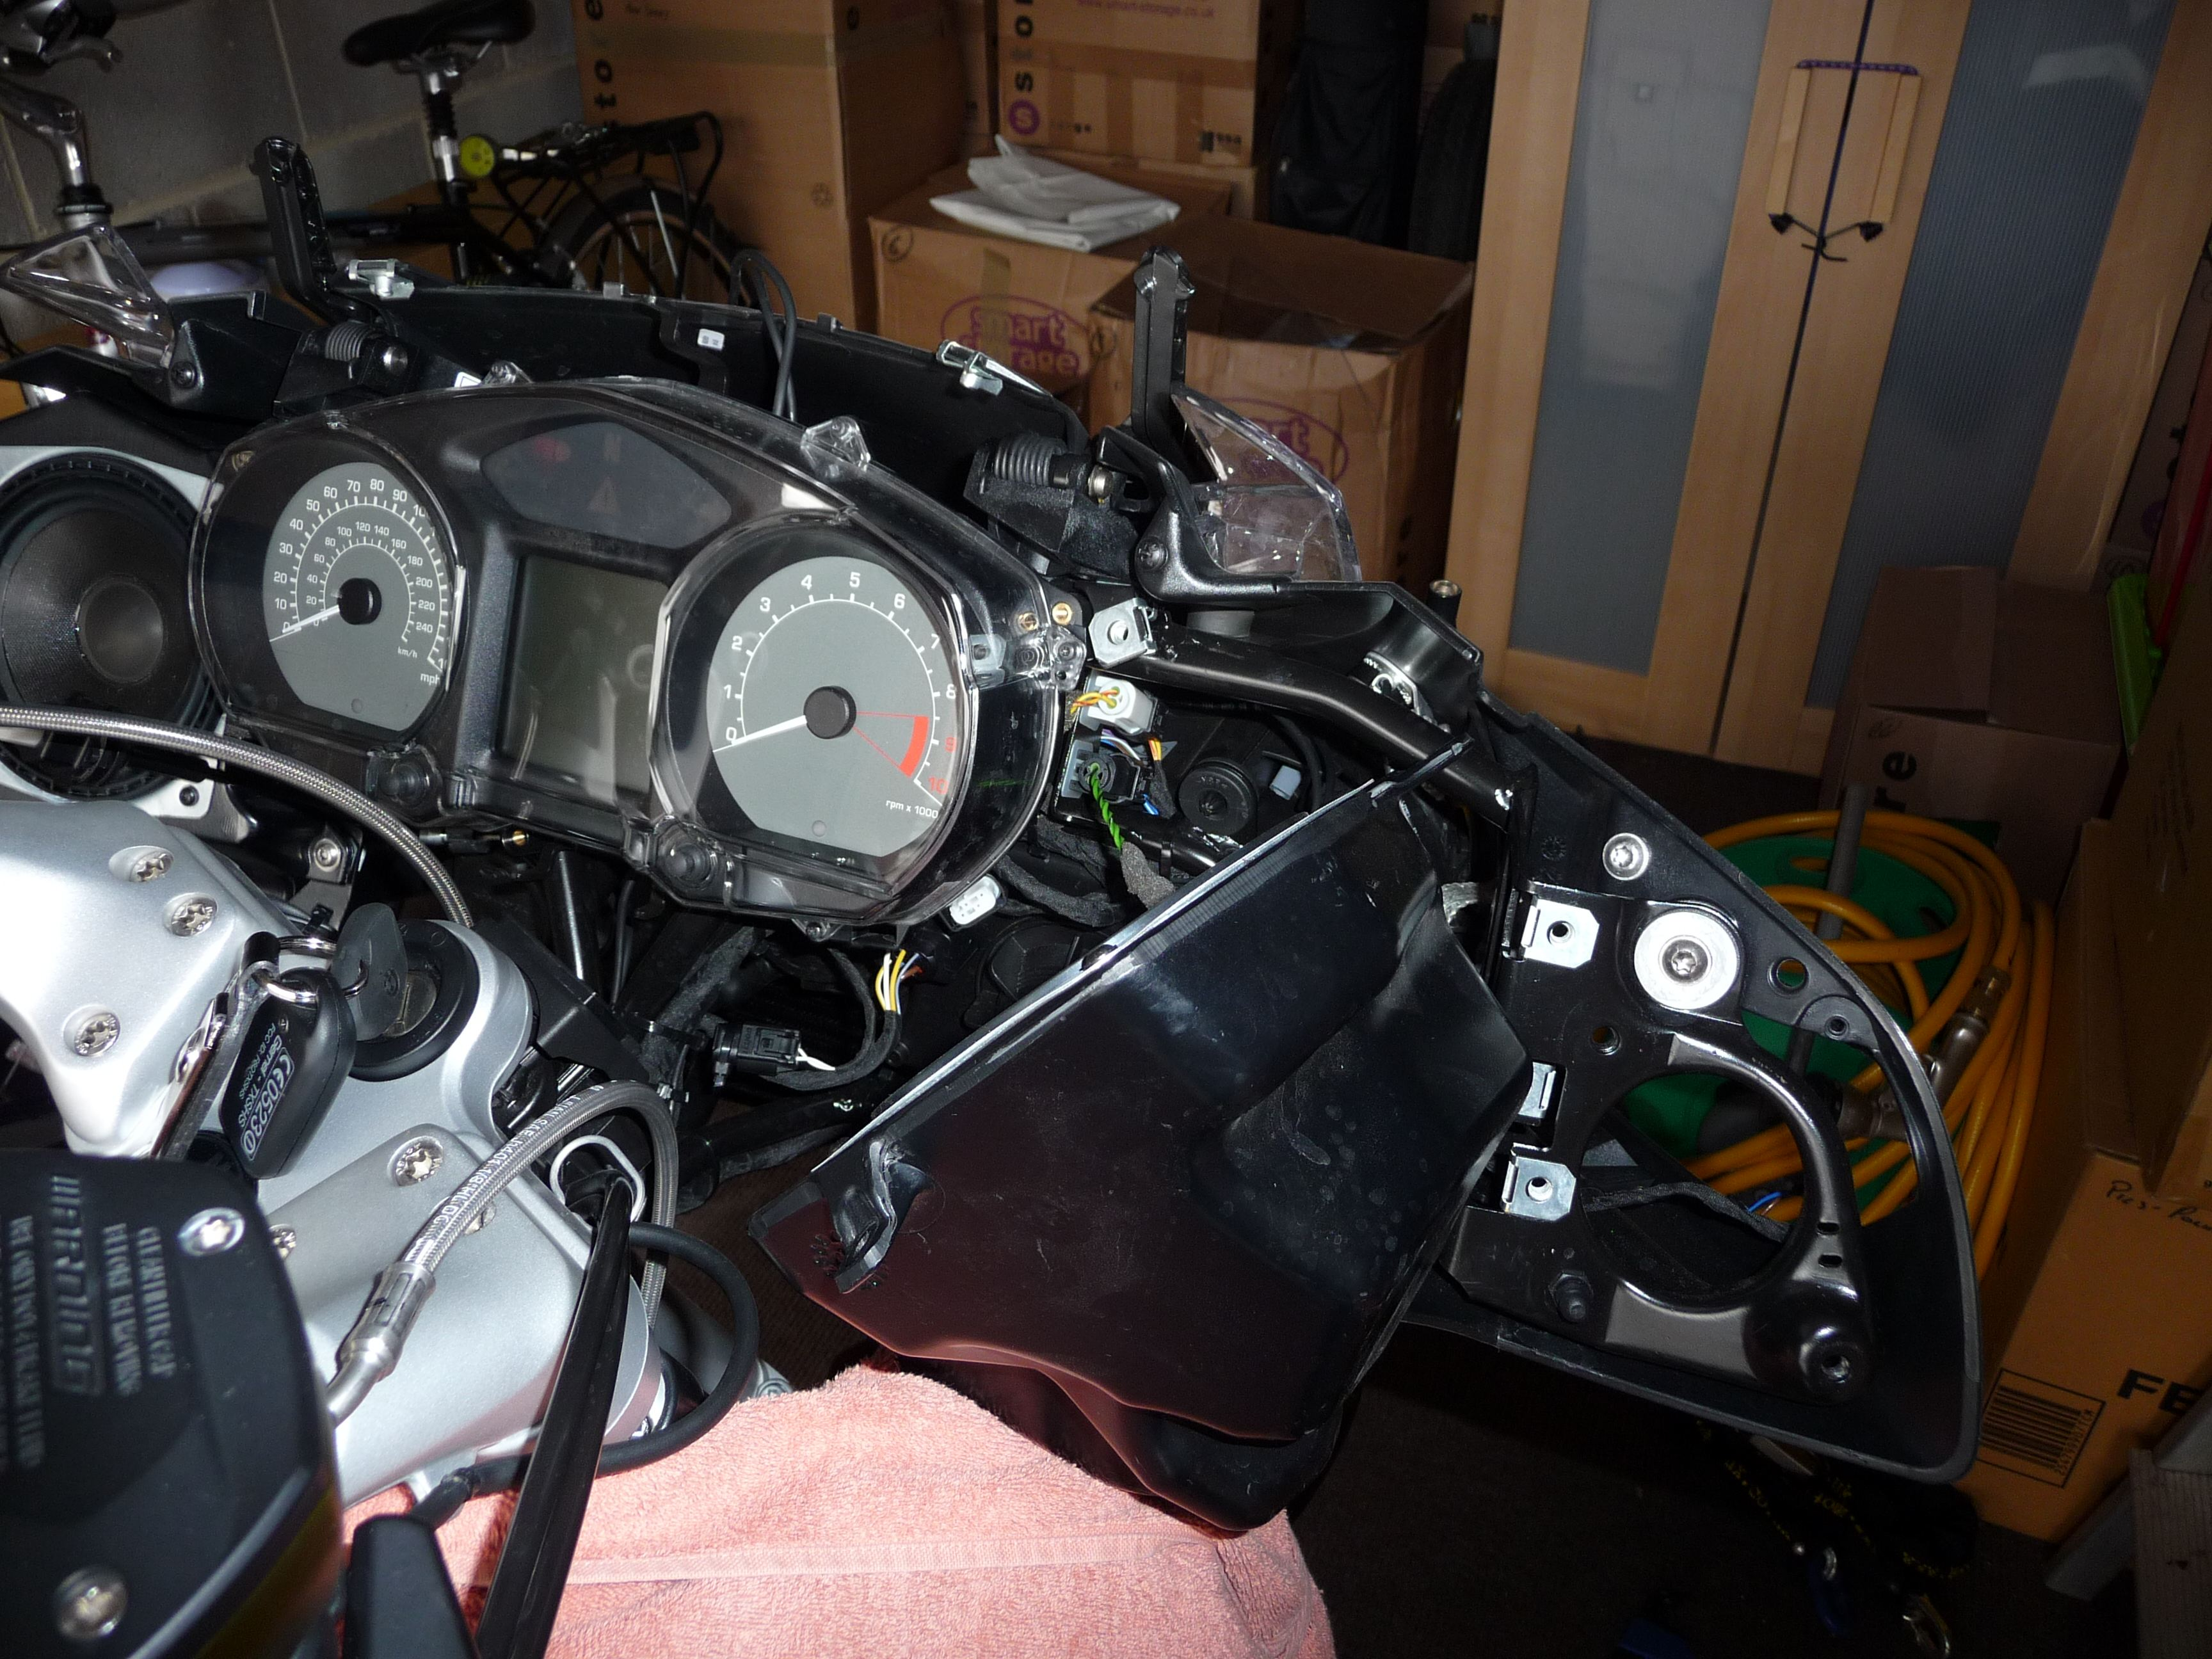 2010 bmw r1200rt wiring diagram easy wiring diagrams u2022 rh art isere com 2006 bmw r1200rt wiring diagram bmw r1200rt wiring schematic